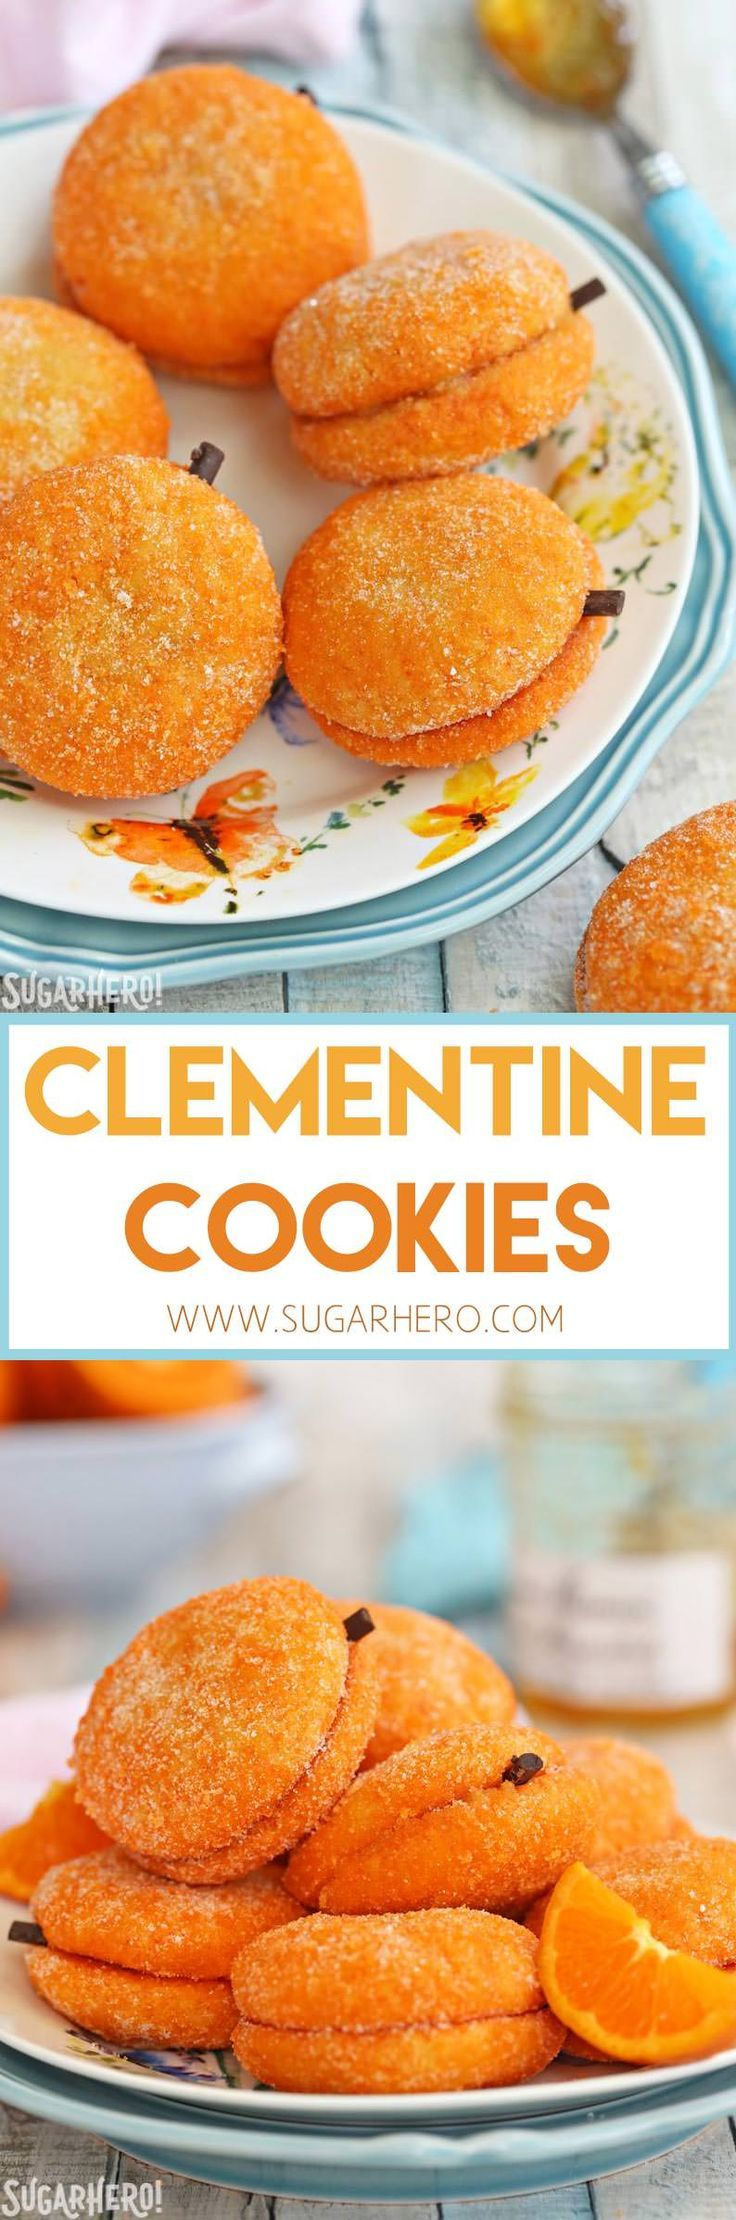 Clementine Cookies - beautiful sandwich cookies that look AND taste like real clementines! | From SugarHero.com